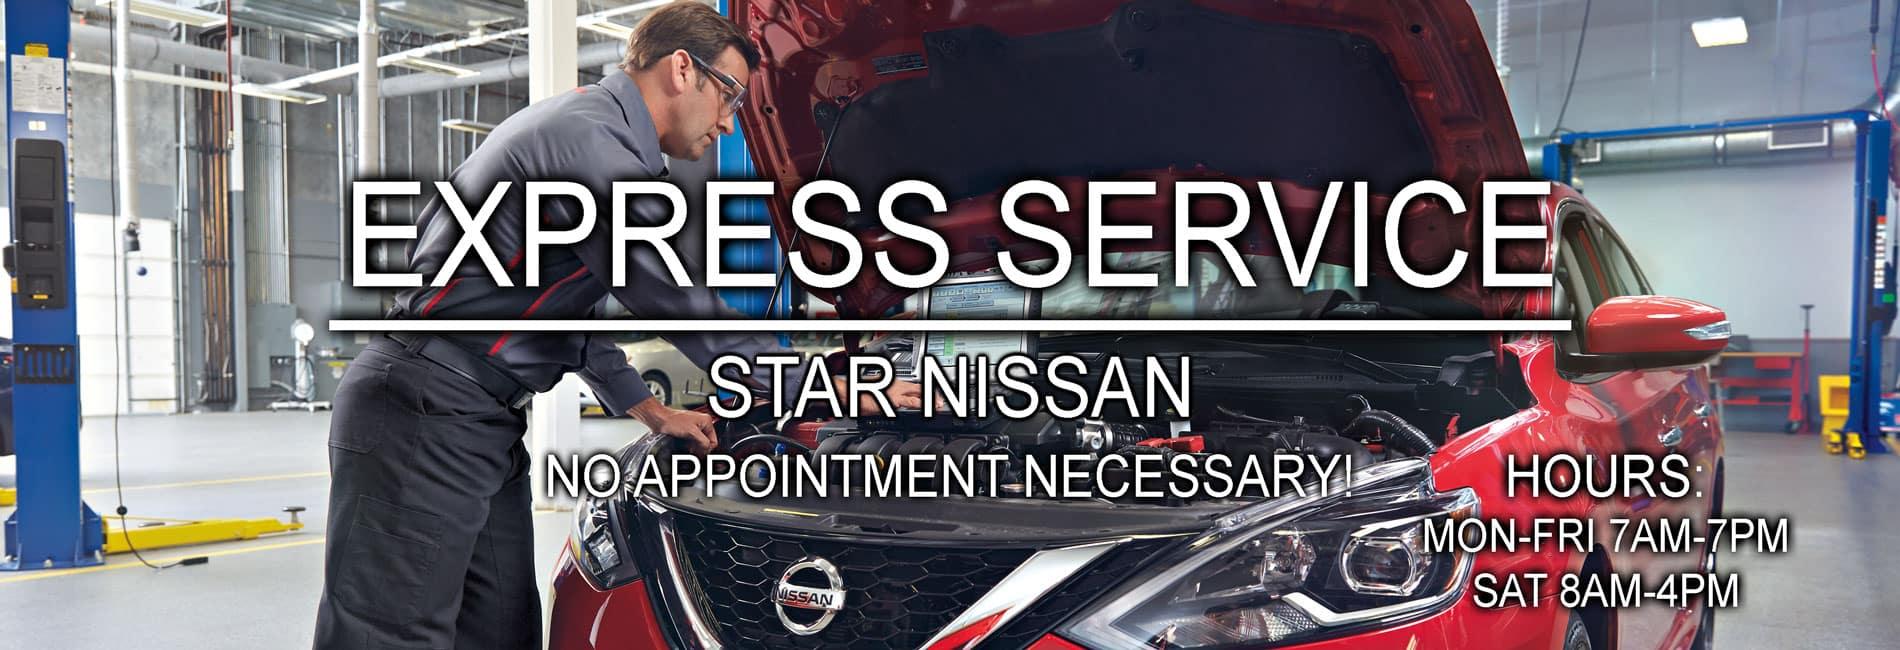 Express Service at Star Nissan